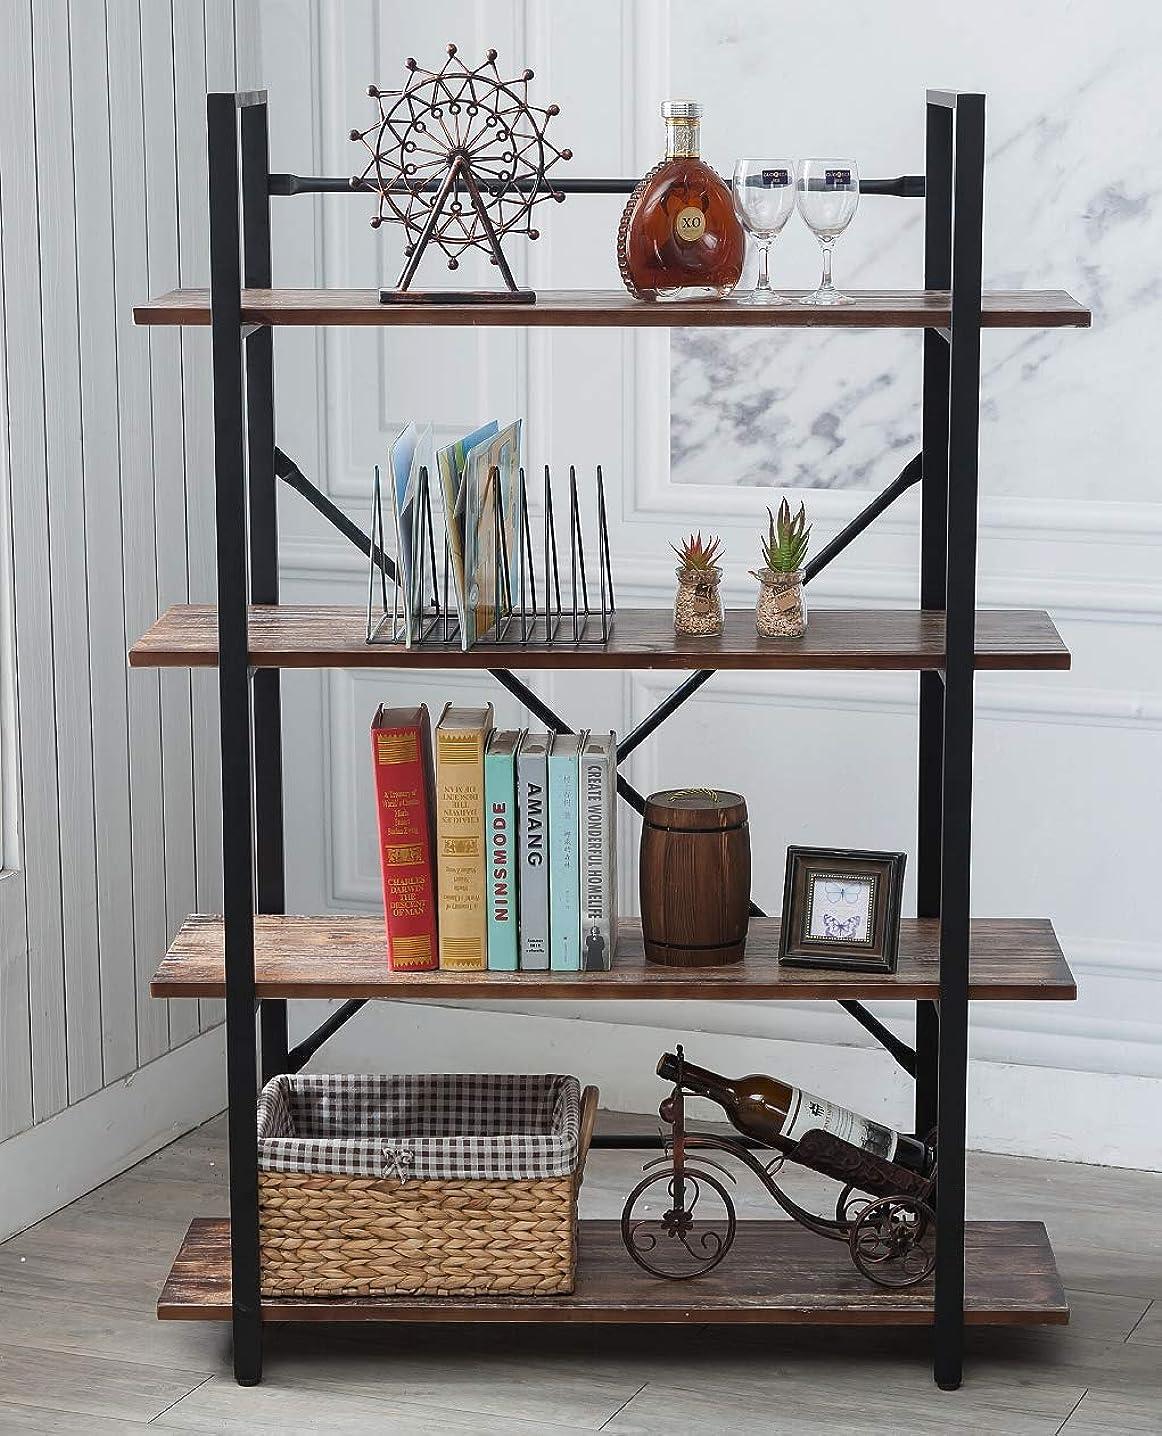 BIXIRAO 4 Tiers Industrial Open Bookcases, Wood Book Shelves, Etagere - Storage Rack Display Stand - Metal Book Shelves, Black (4-Tier Solid Wood Bookcase)